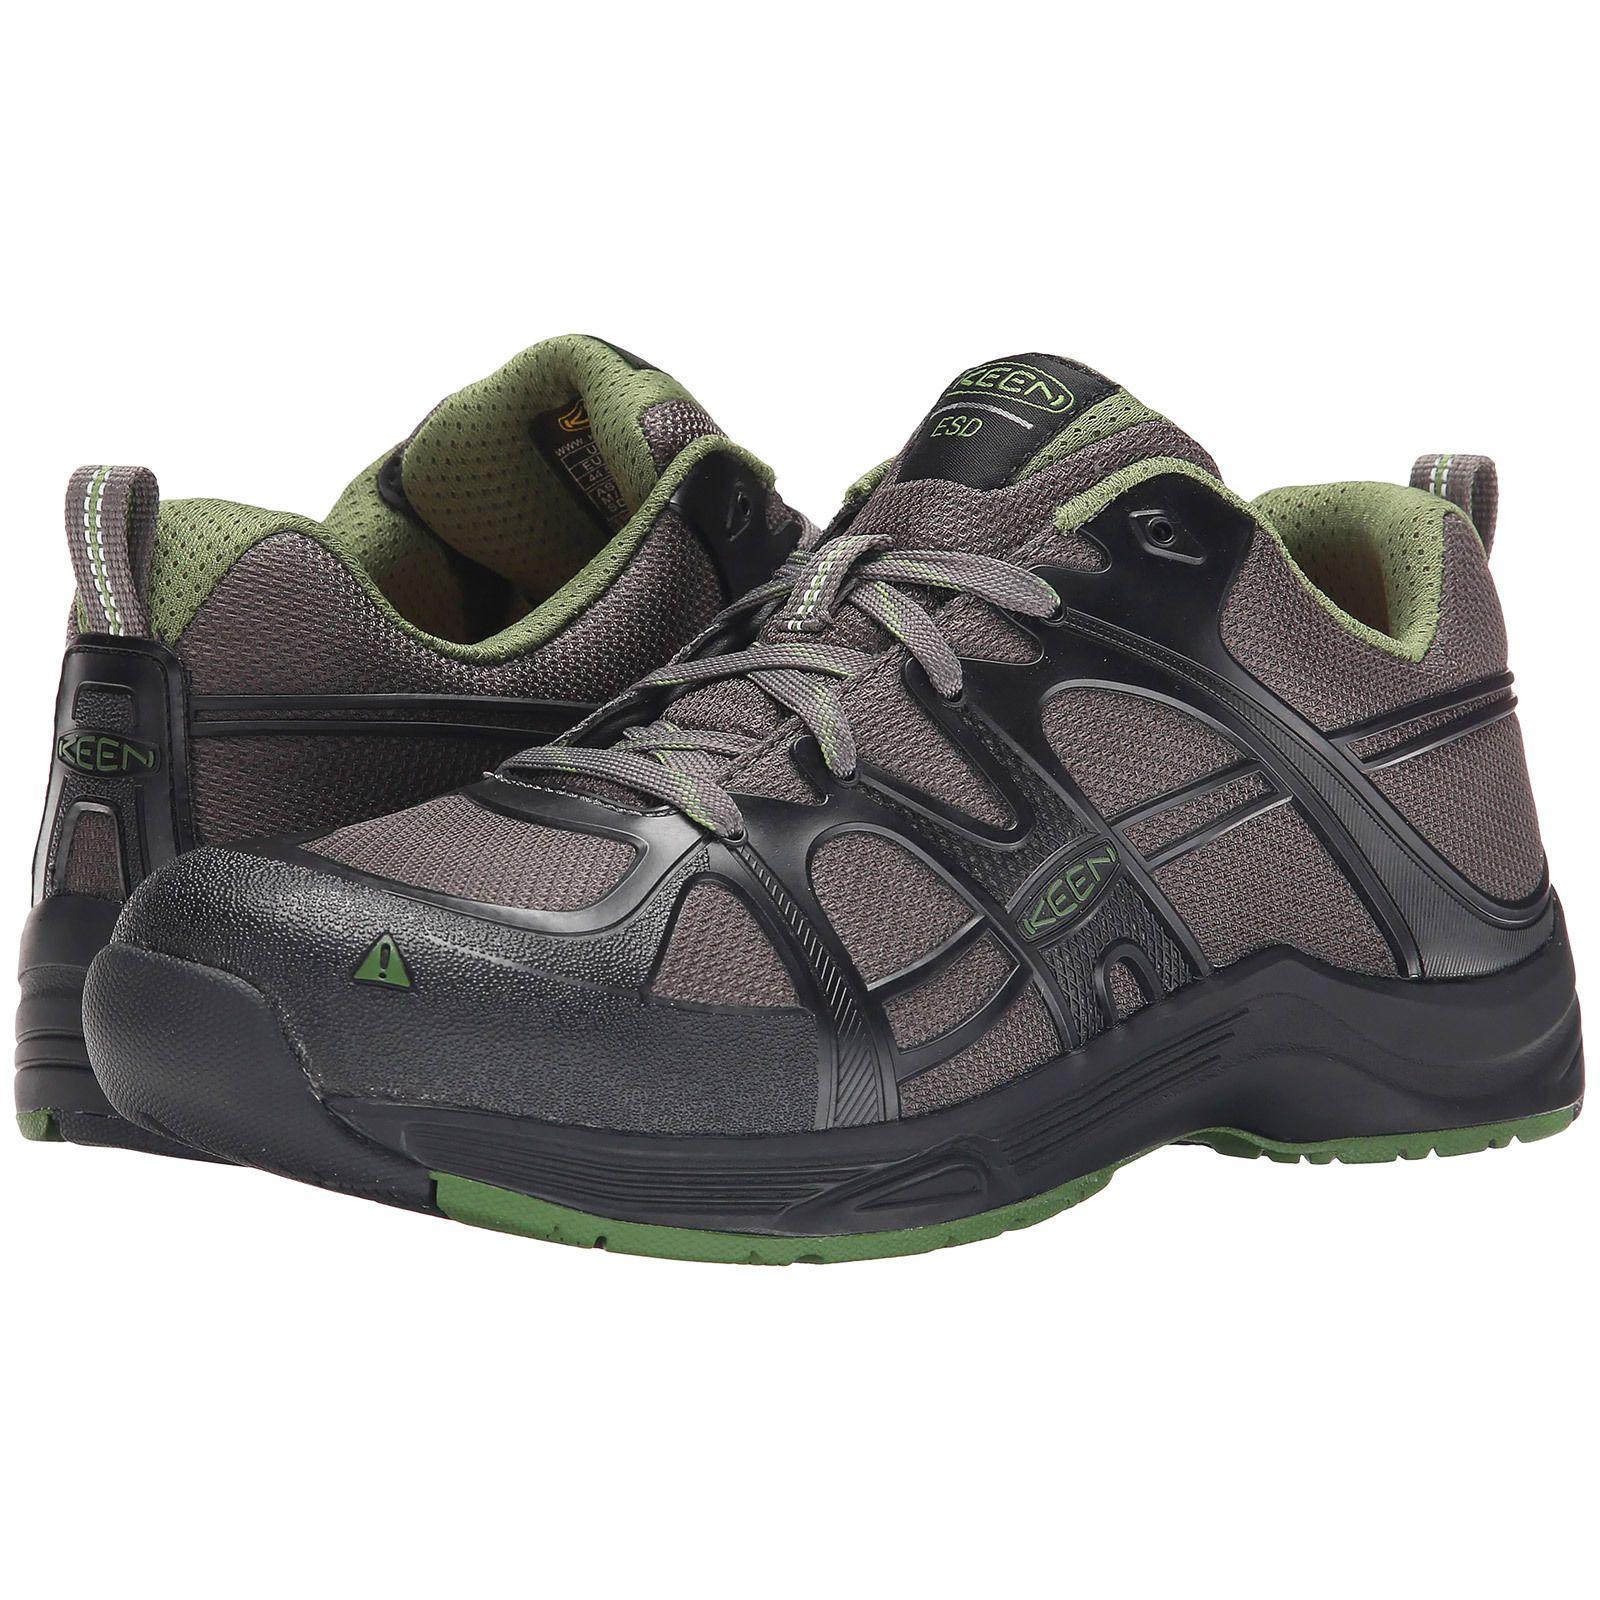 TIMBERLAND Outdoor 89113 Chaussures De Trekking Hommes Montagne Athlétique - noir, 43